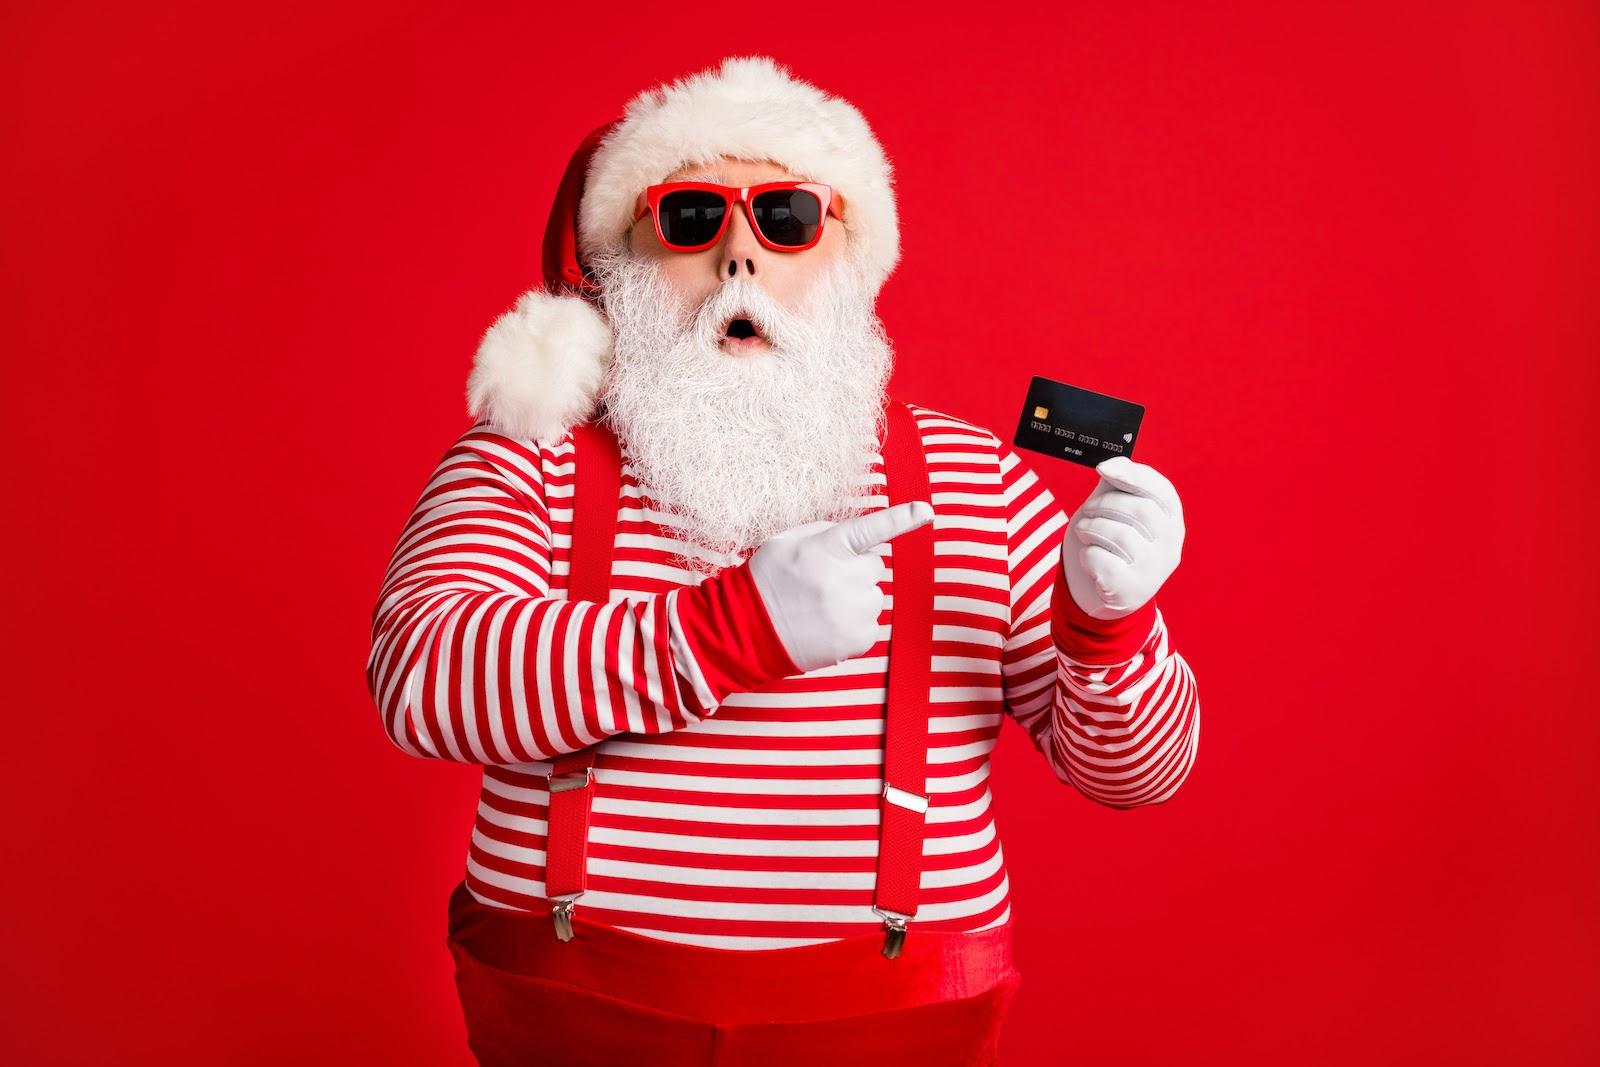 Santa Claus holds a virtual credit card